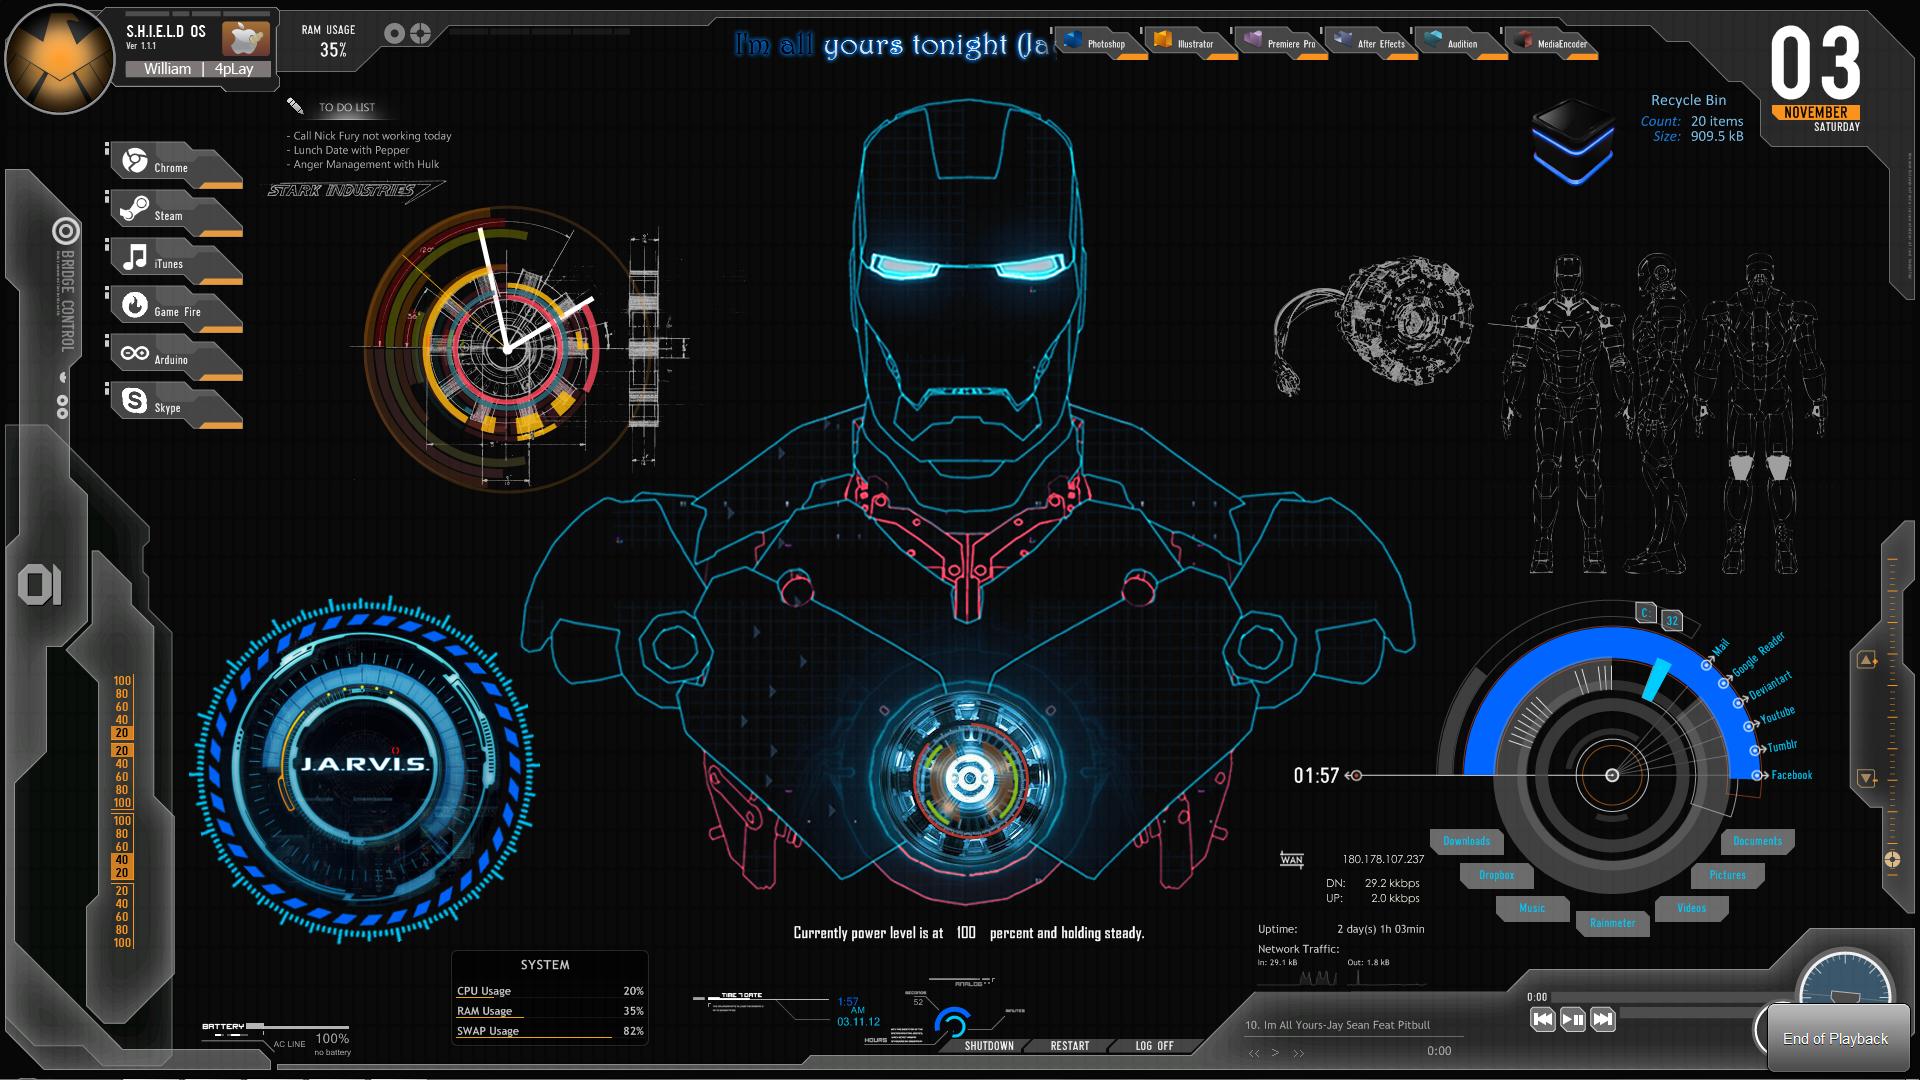 3d Desktop Interface Wallpapers High Resolution with High